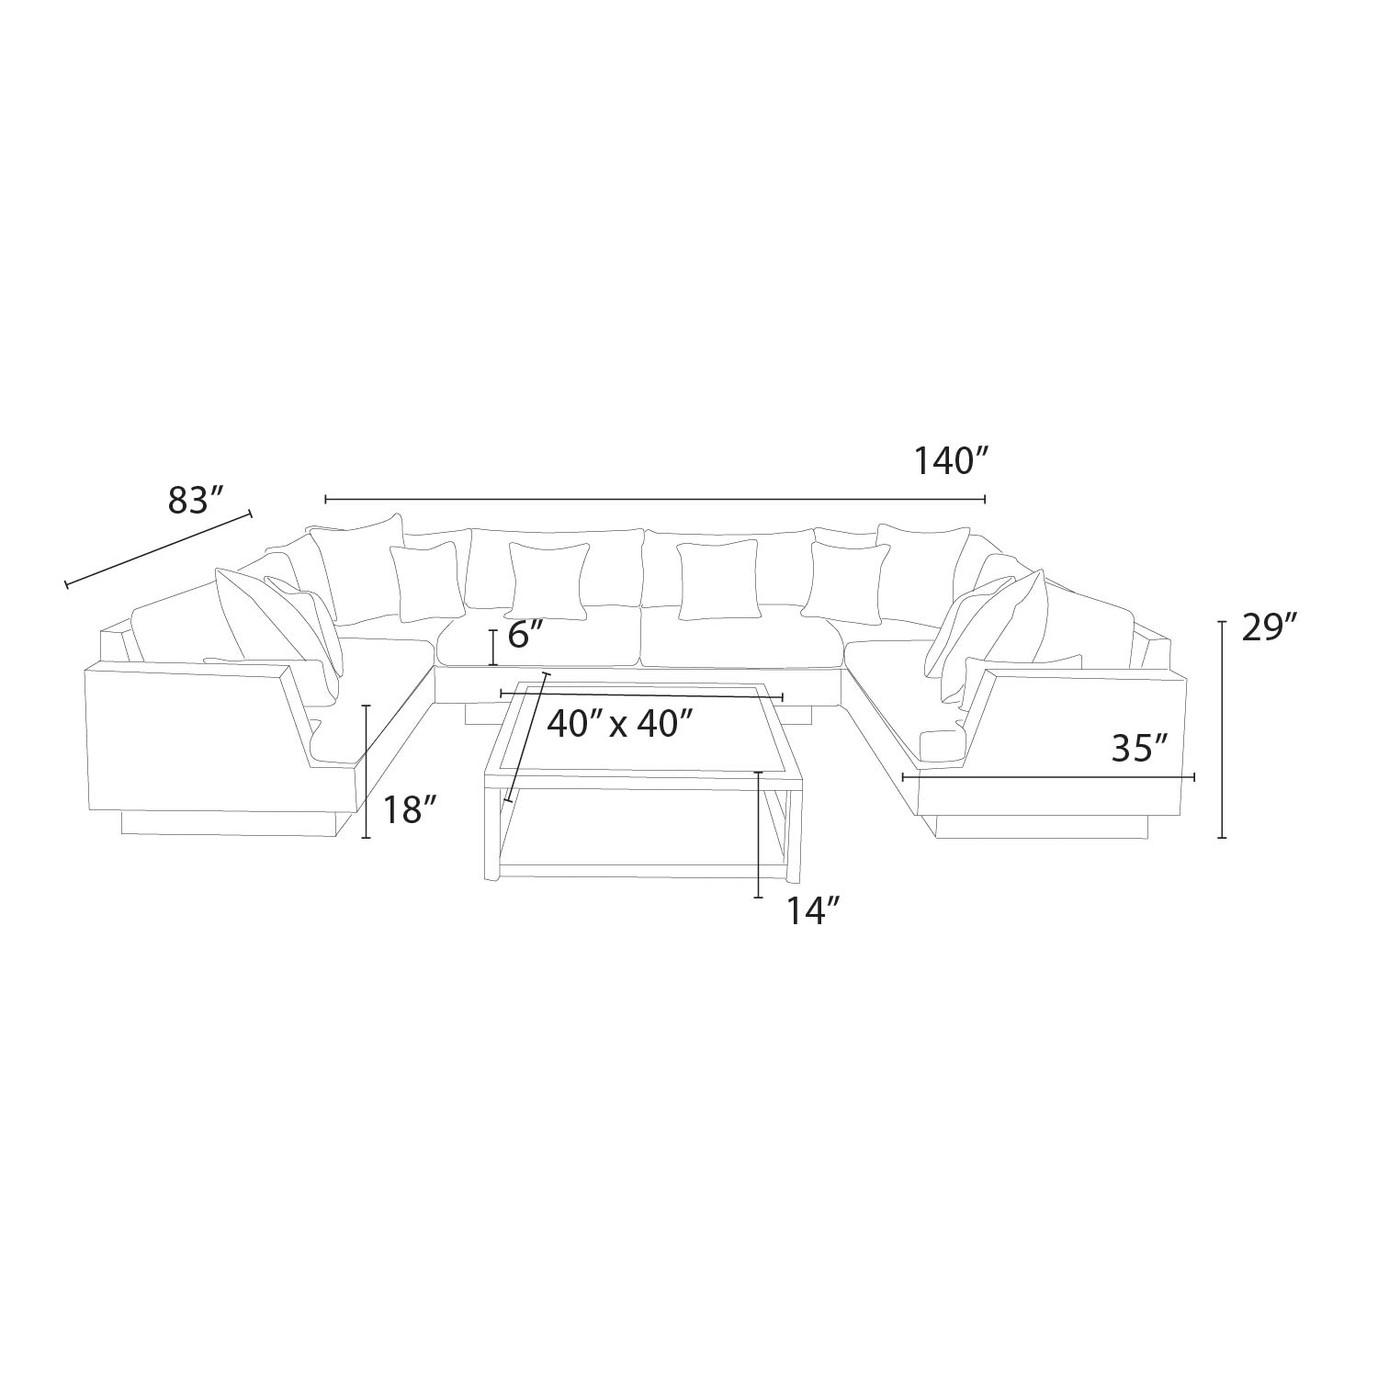 Portofino™ Comfort 7pc Modular Sectional - Heather Beige